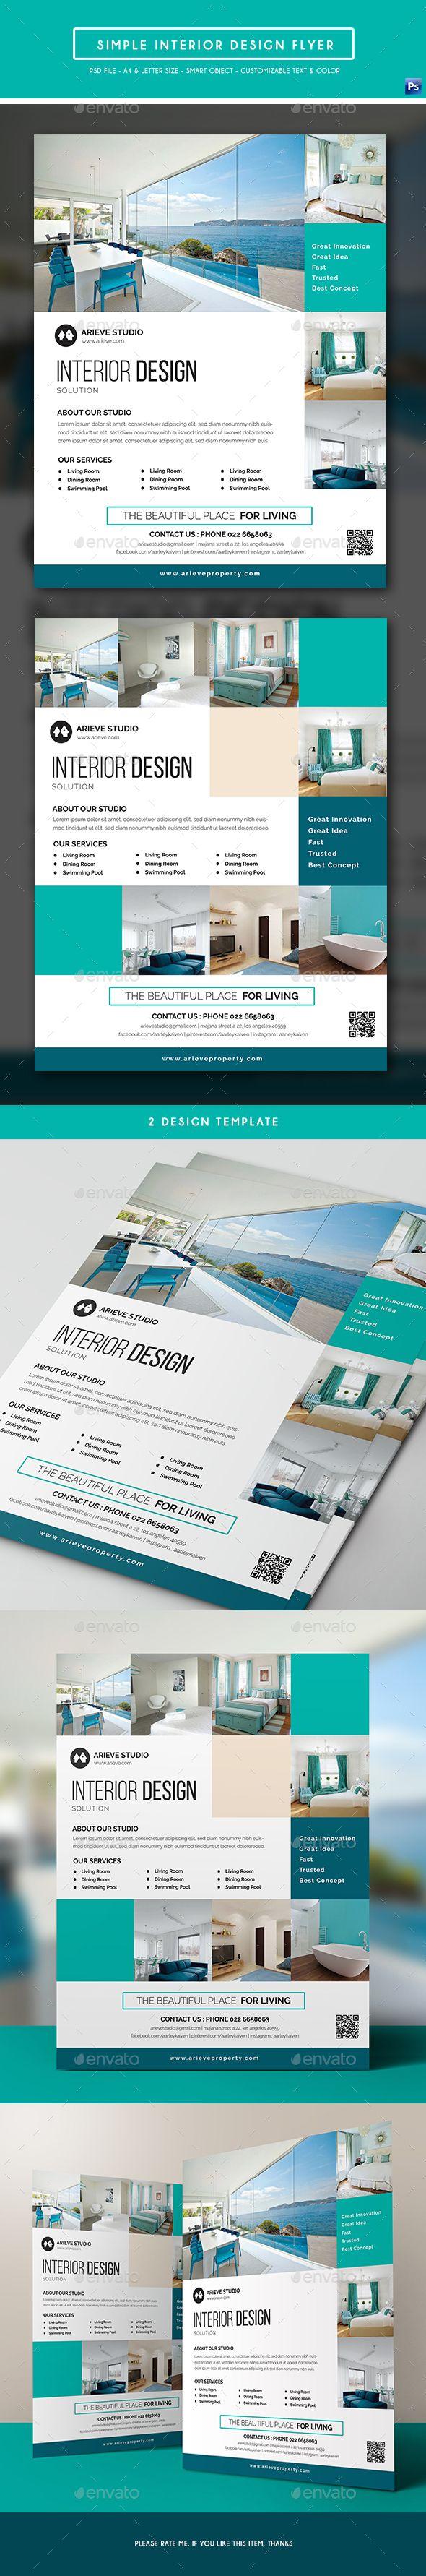 Simple Interior Design Flyer Template PSD. Download here: http://graphicriver.net/item/simple-interior-design-flyer/16612439?ref=ksioks